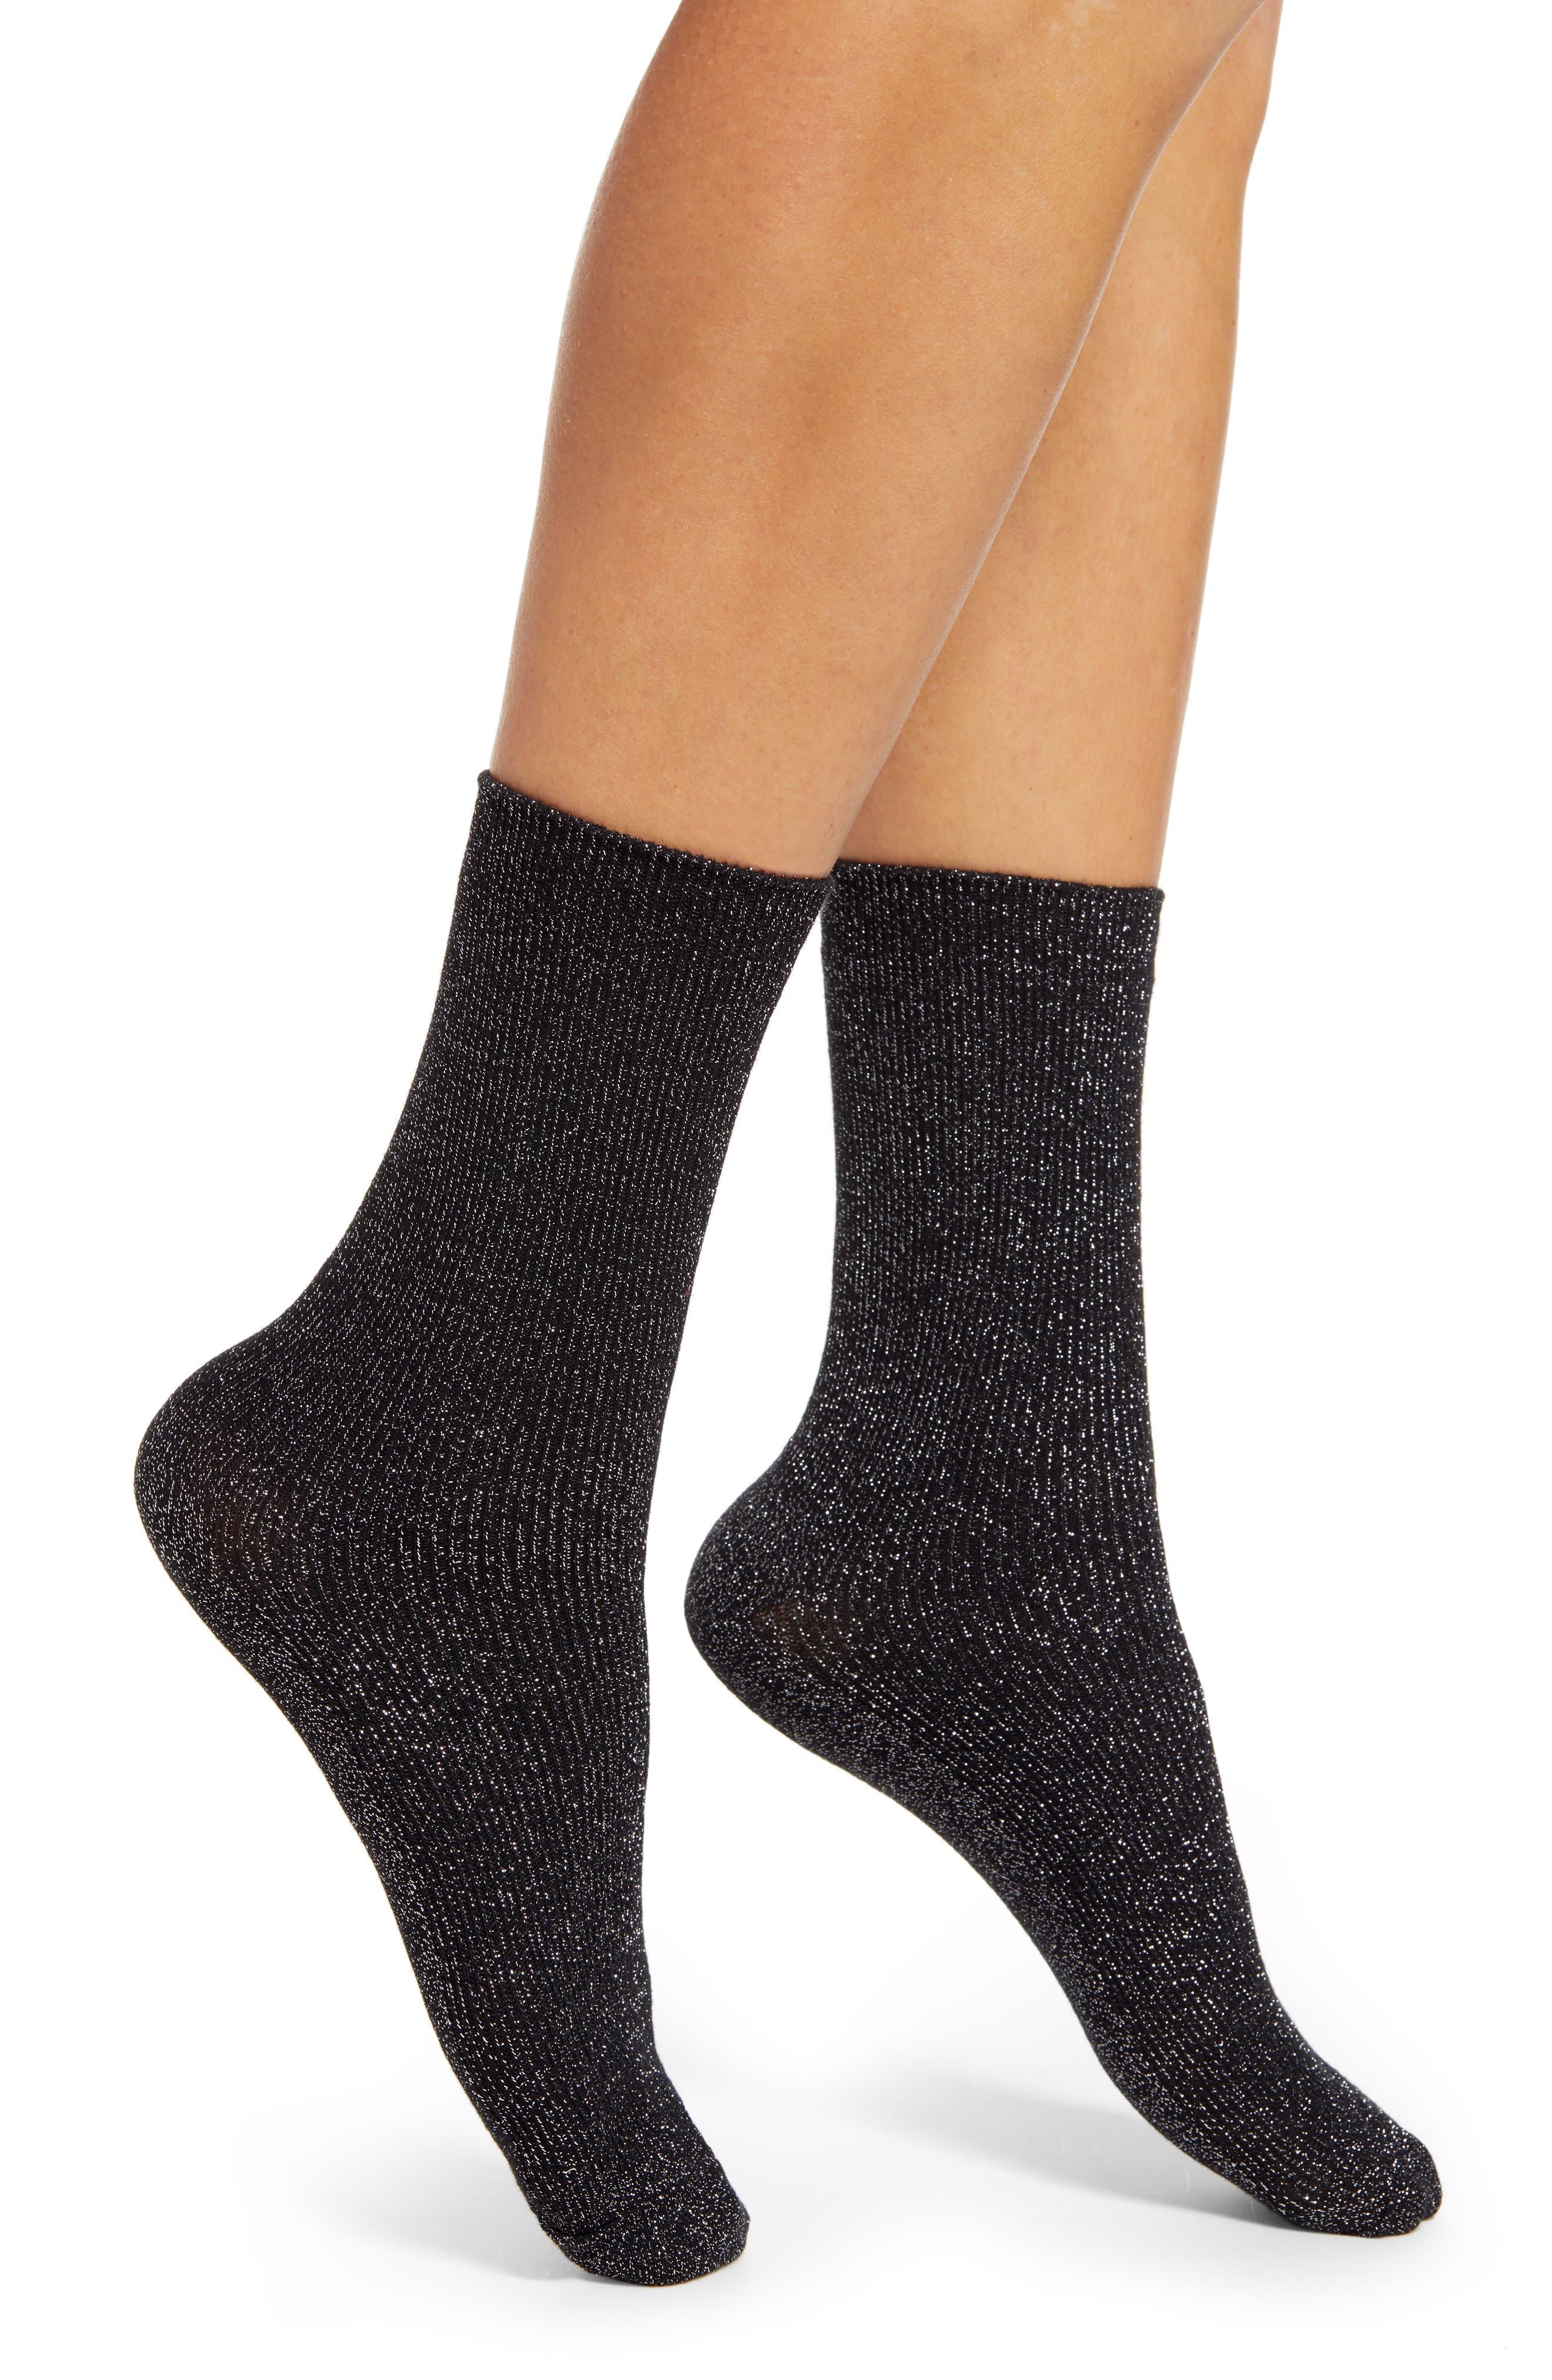 Prima Metallic Crew Socks | Nordstrom